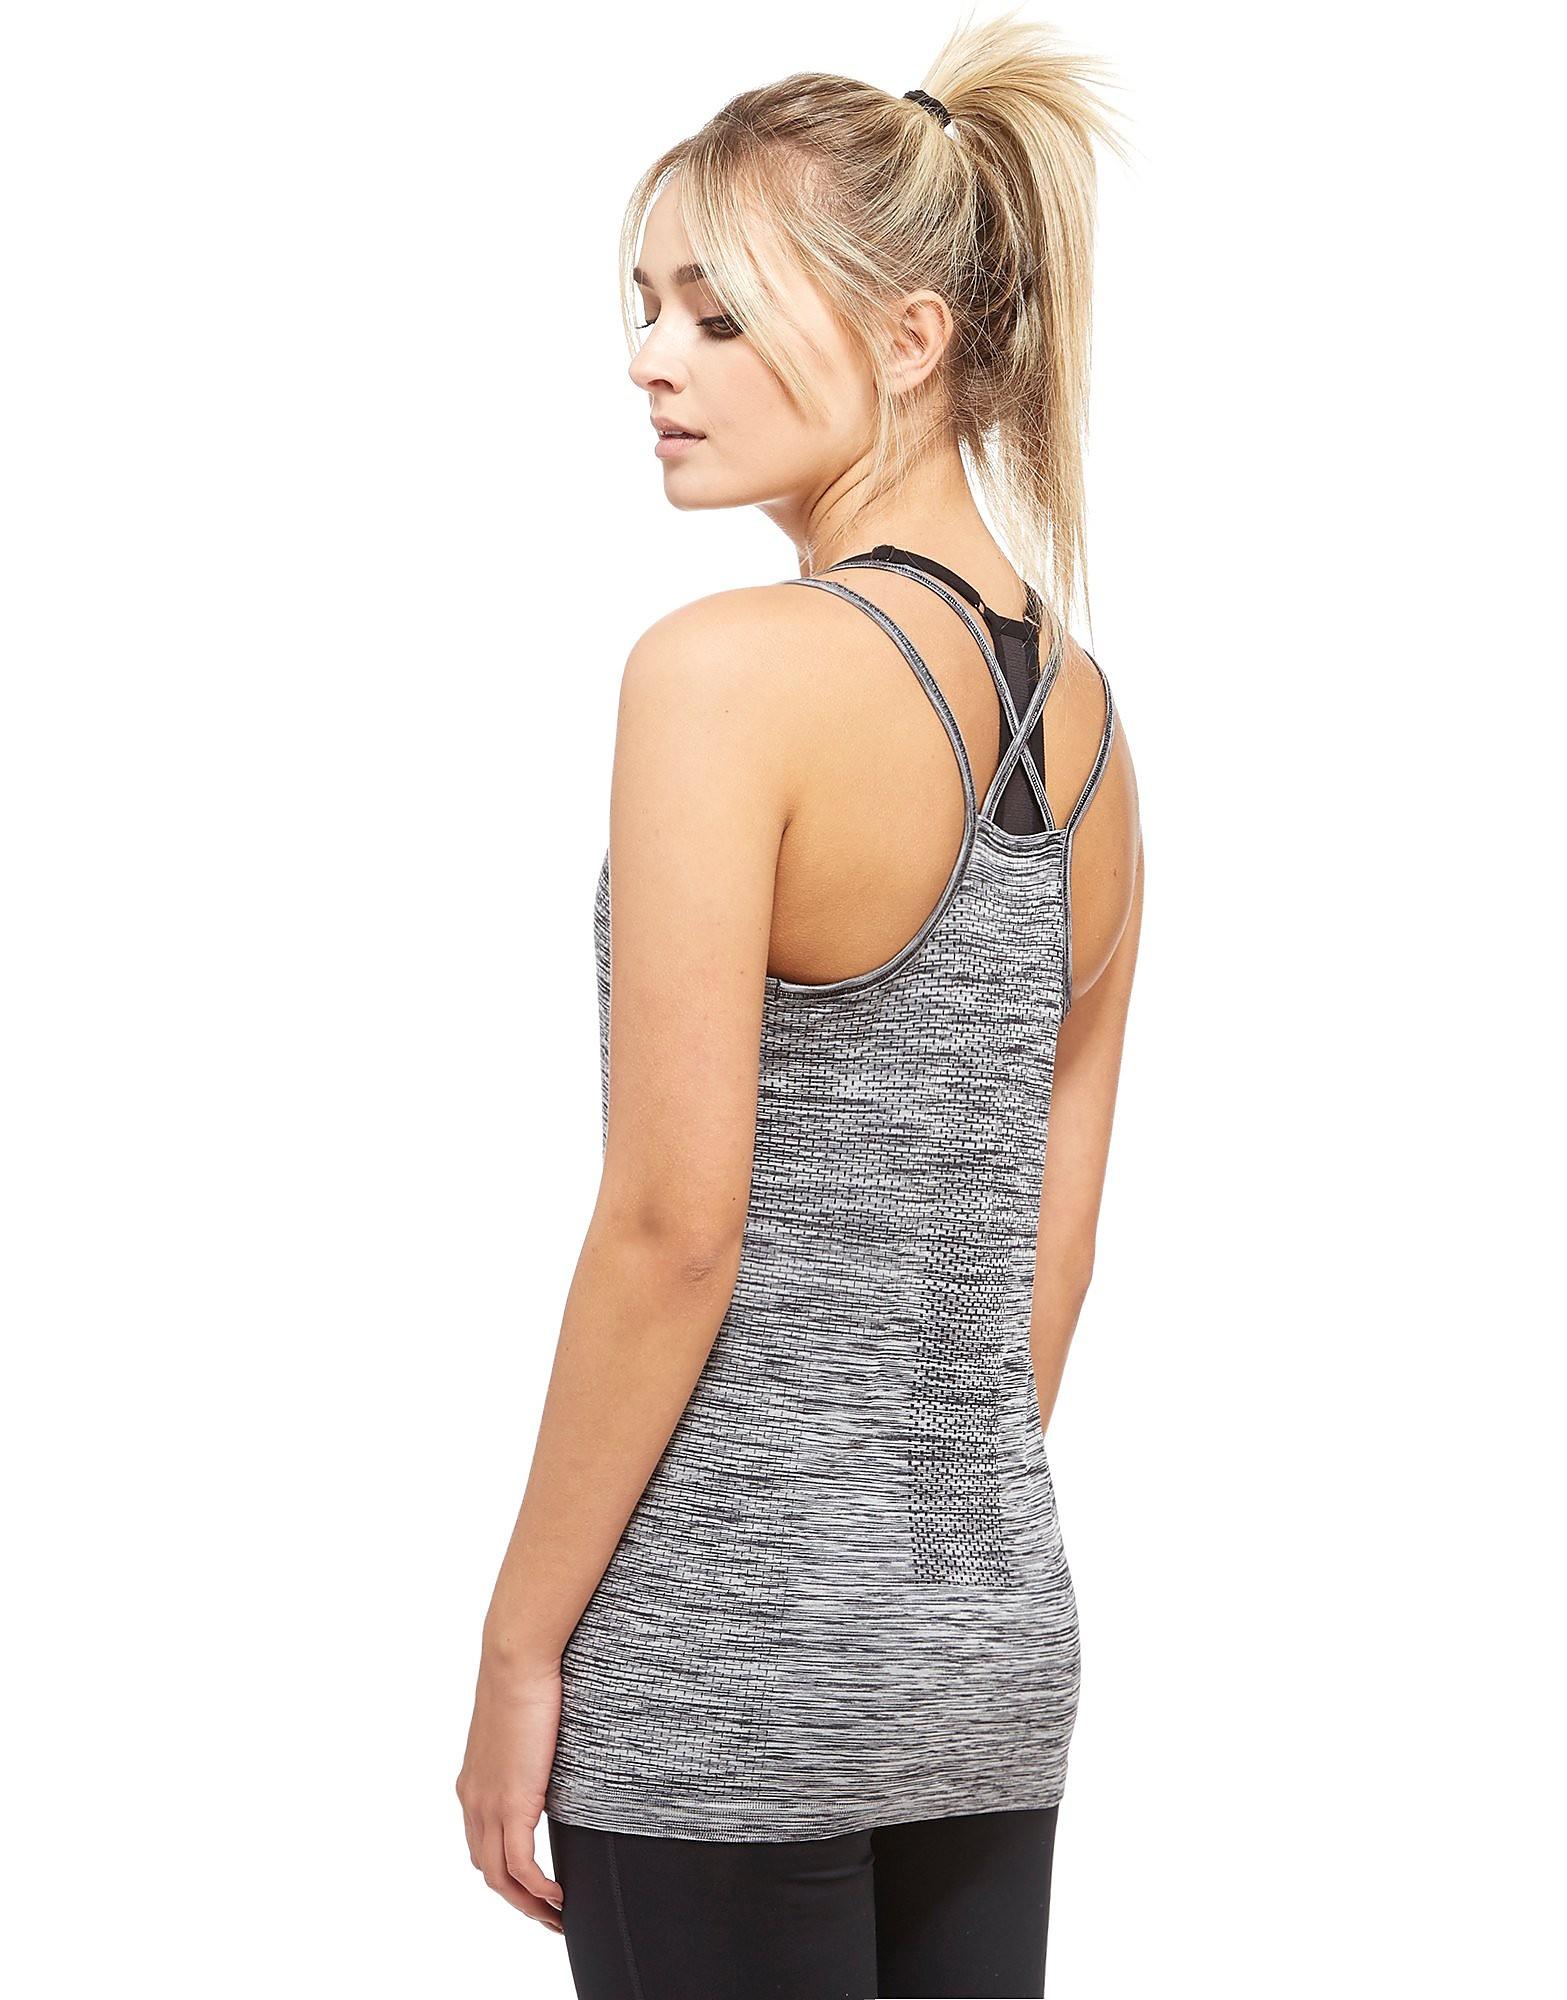 Nike Dry Knit Tank Top